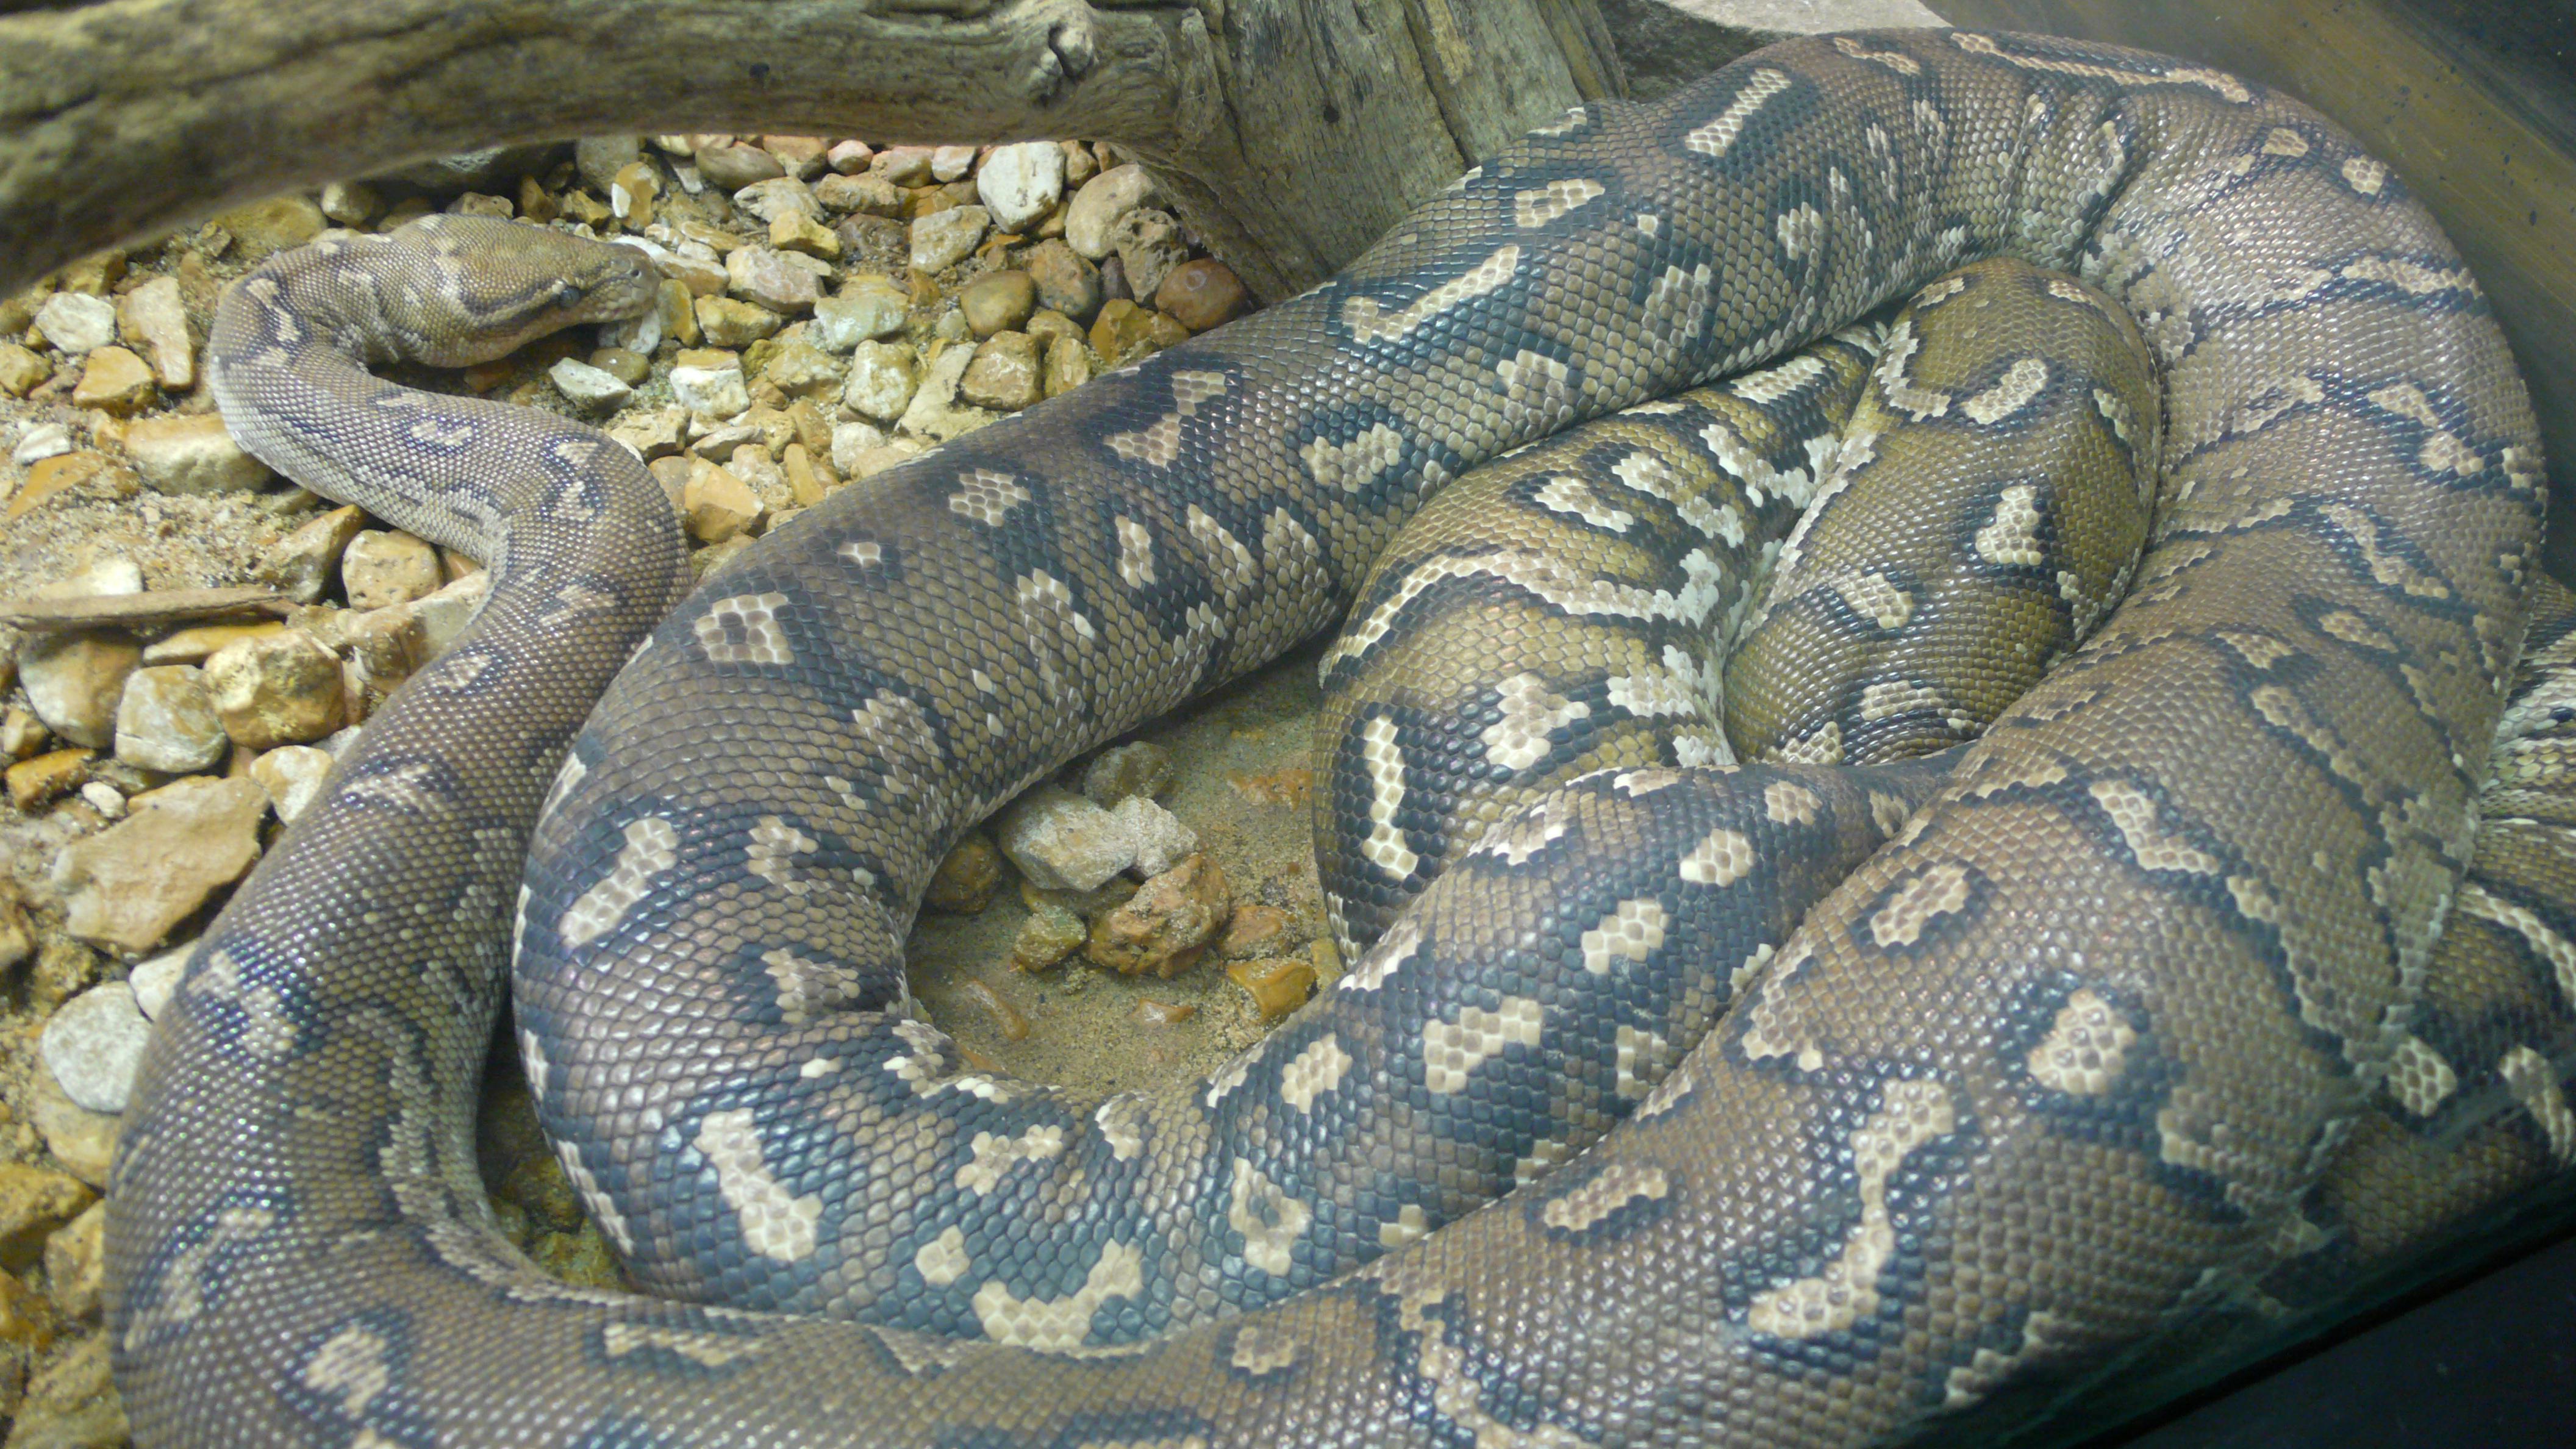 Angolan Python Snake Pictures